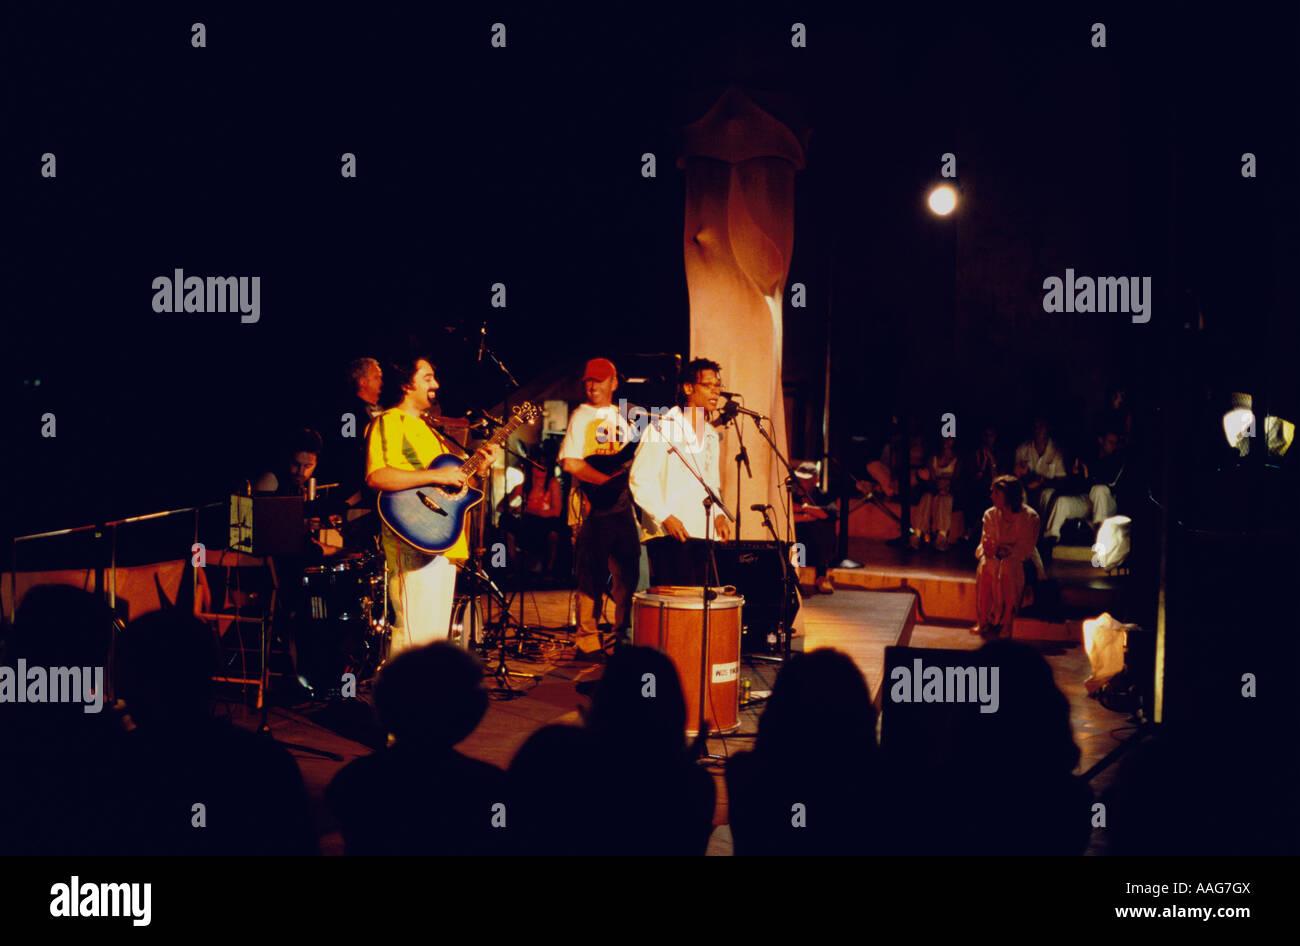 Summer concert at the roof of Casa Mila A Gaudi La Pedrera Barcelona Catalonia Spain Stock Photo